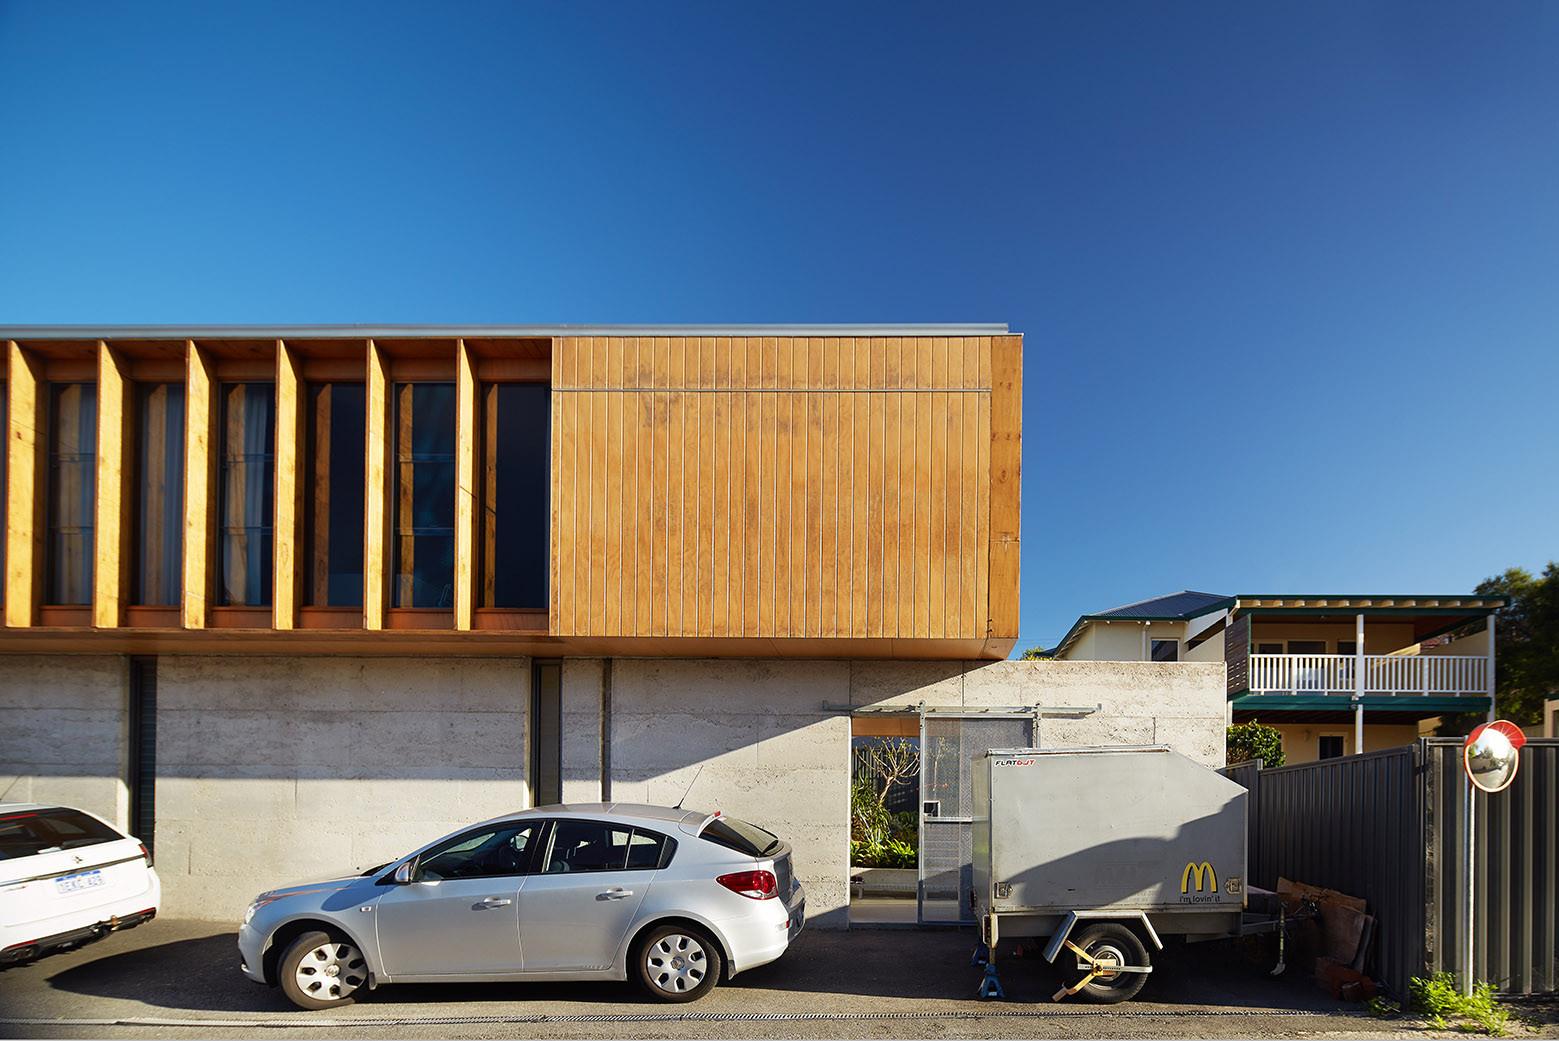 Design house car - North Perth House Jonathan Lake Architects Robert Frith